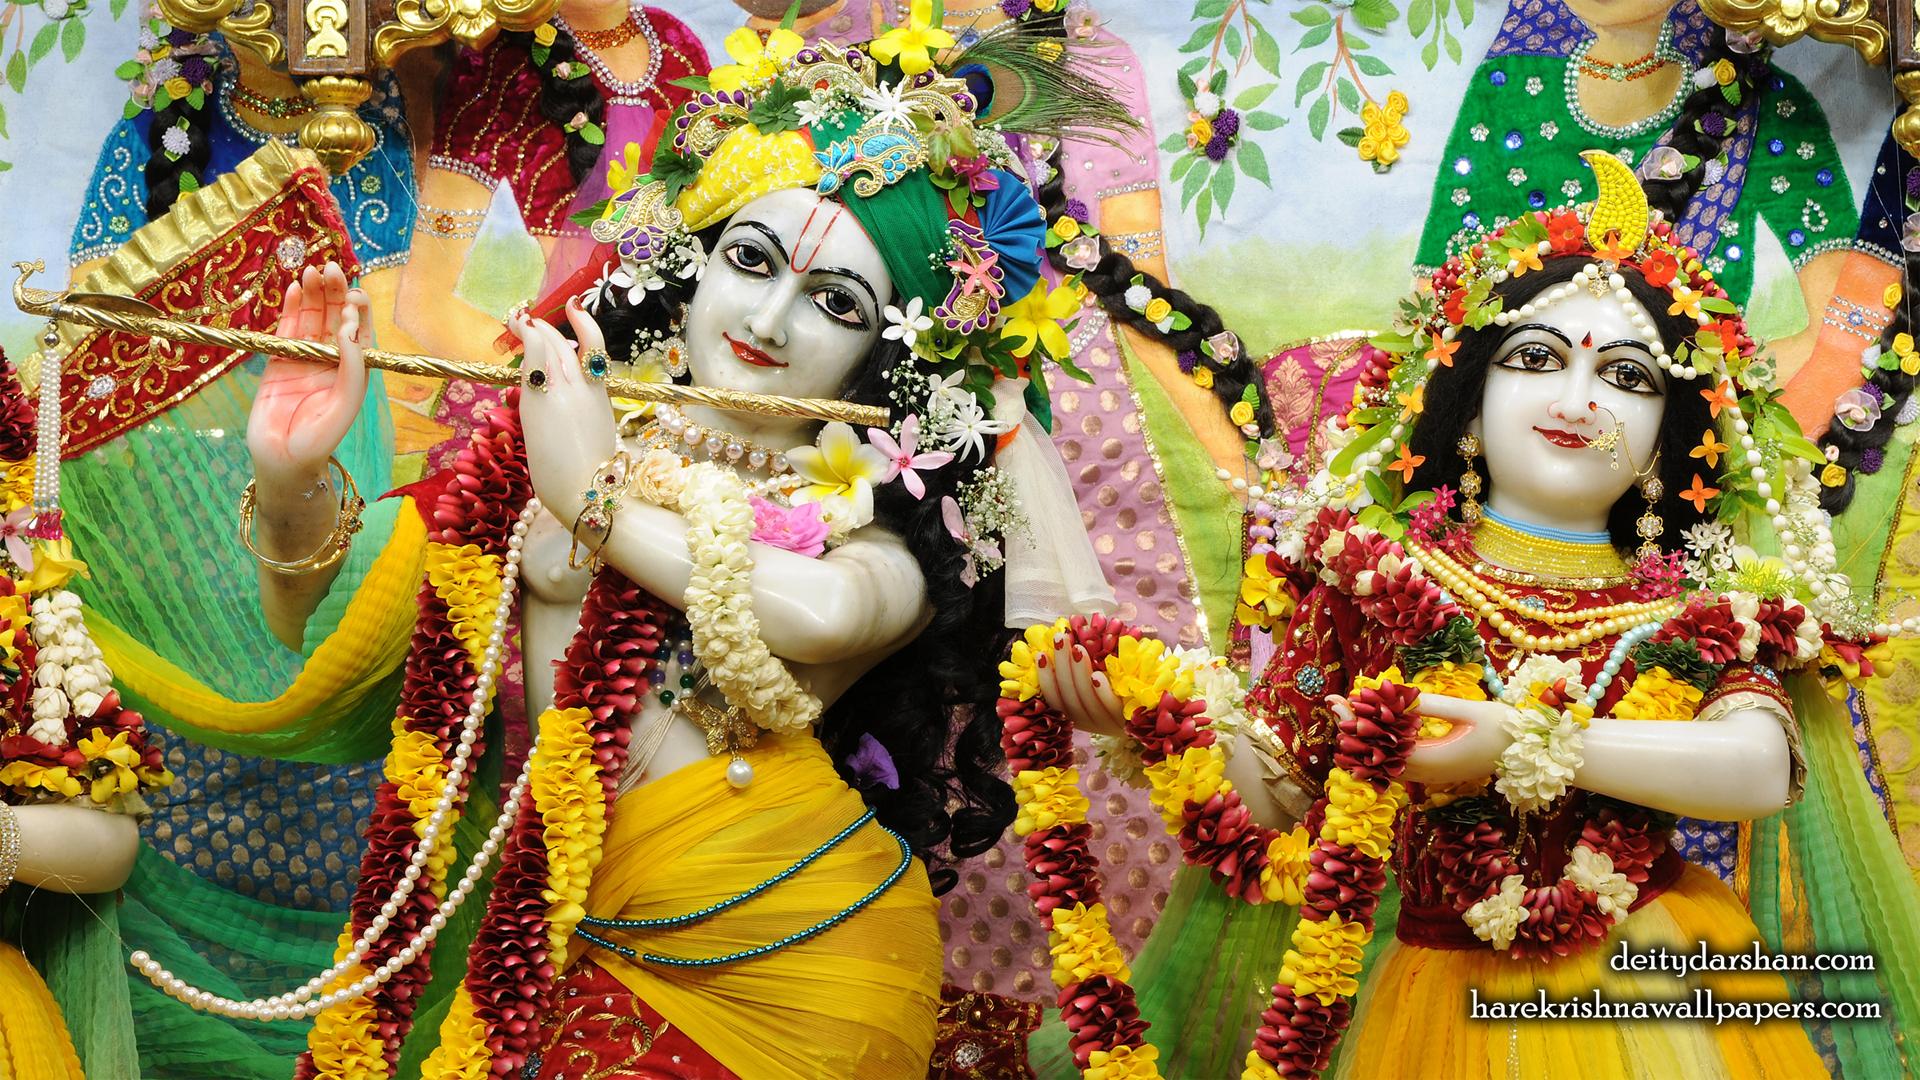 Sri Sri Radha Gopinath Close up Wallpaper (055) Size 1920x1080 Download